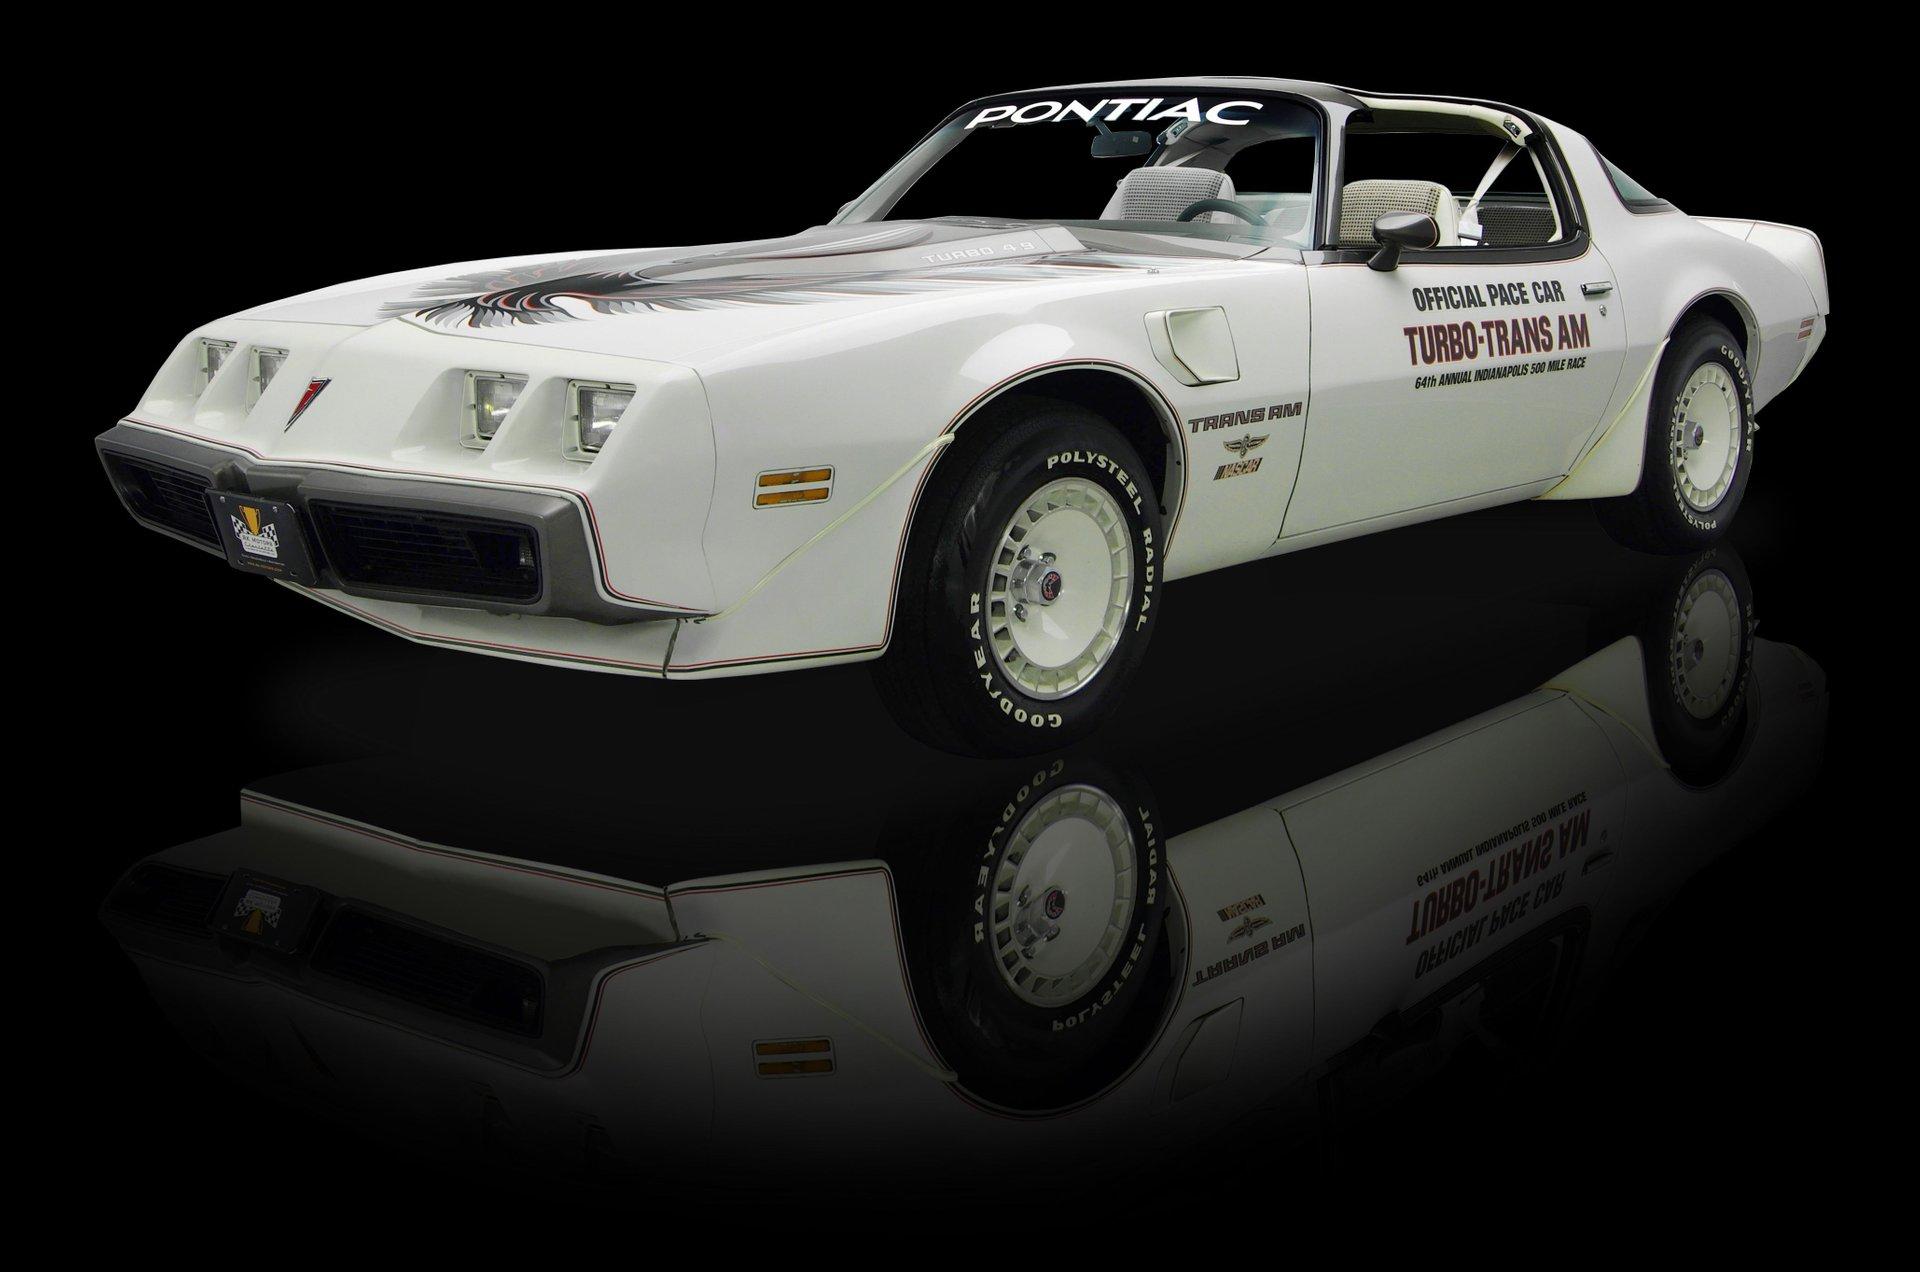 1980 pontiac firebird trans am turbo pace car